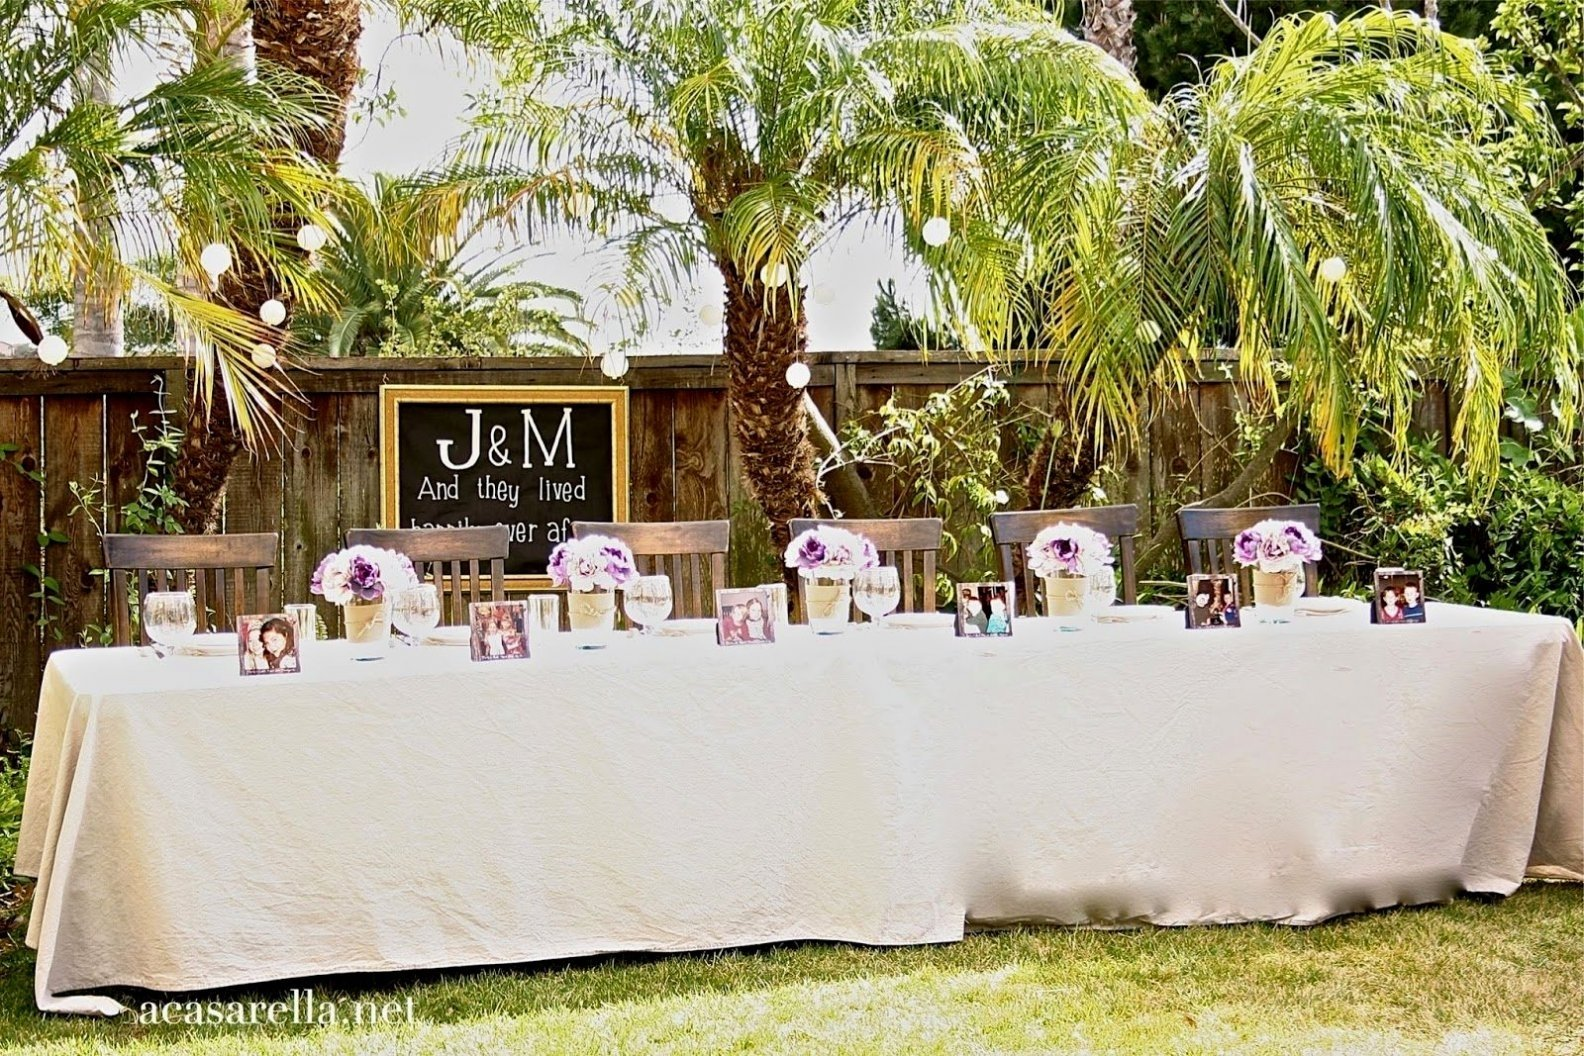 10 Cute Backyard Wedding Ideas For Summer backyard wedding ideas amazing backyard wedding ideas for summer